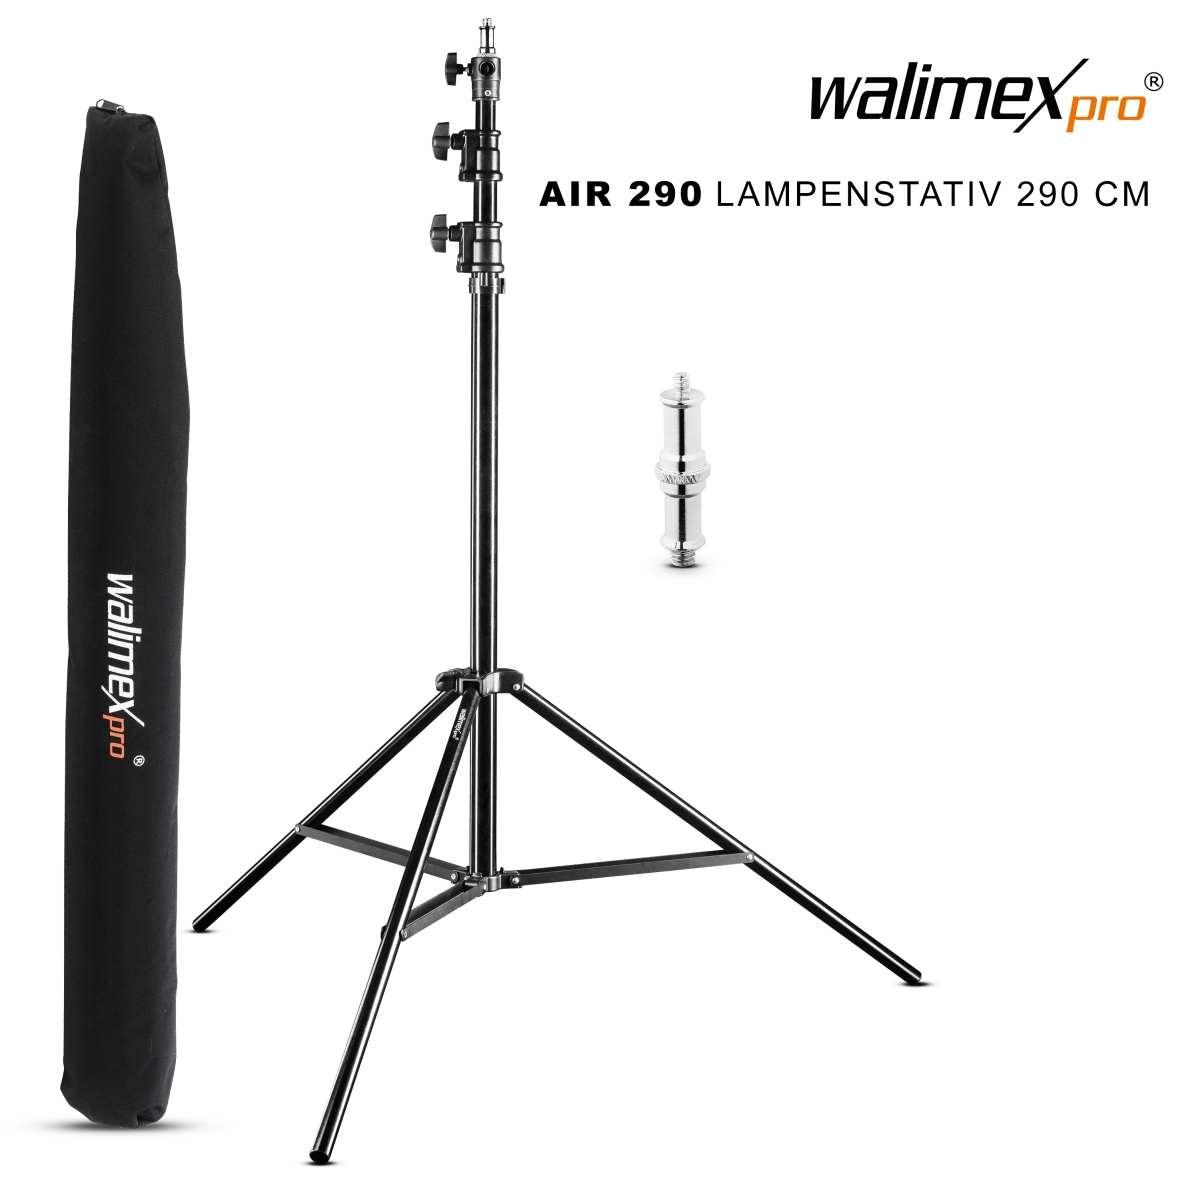 Walimex pro Lamp Tripod AIR, 290cm